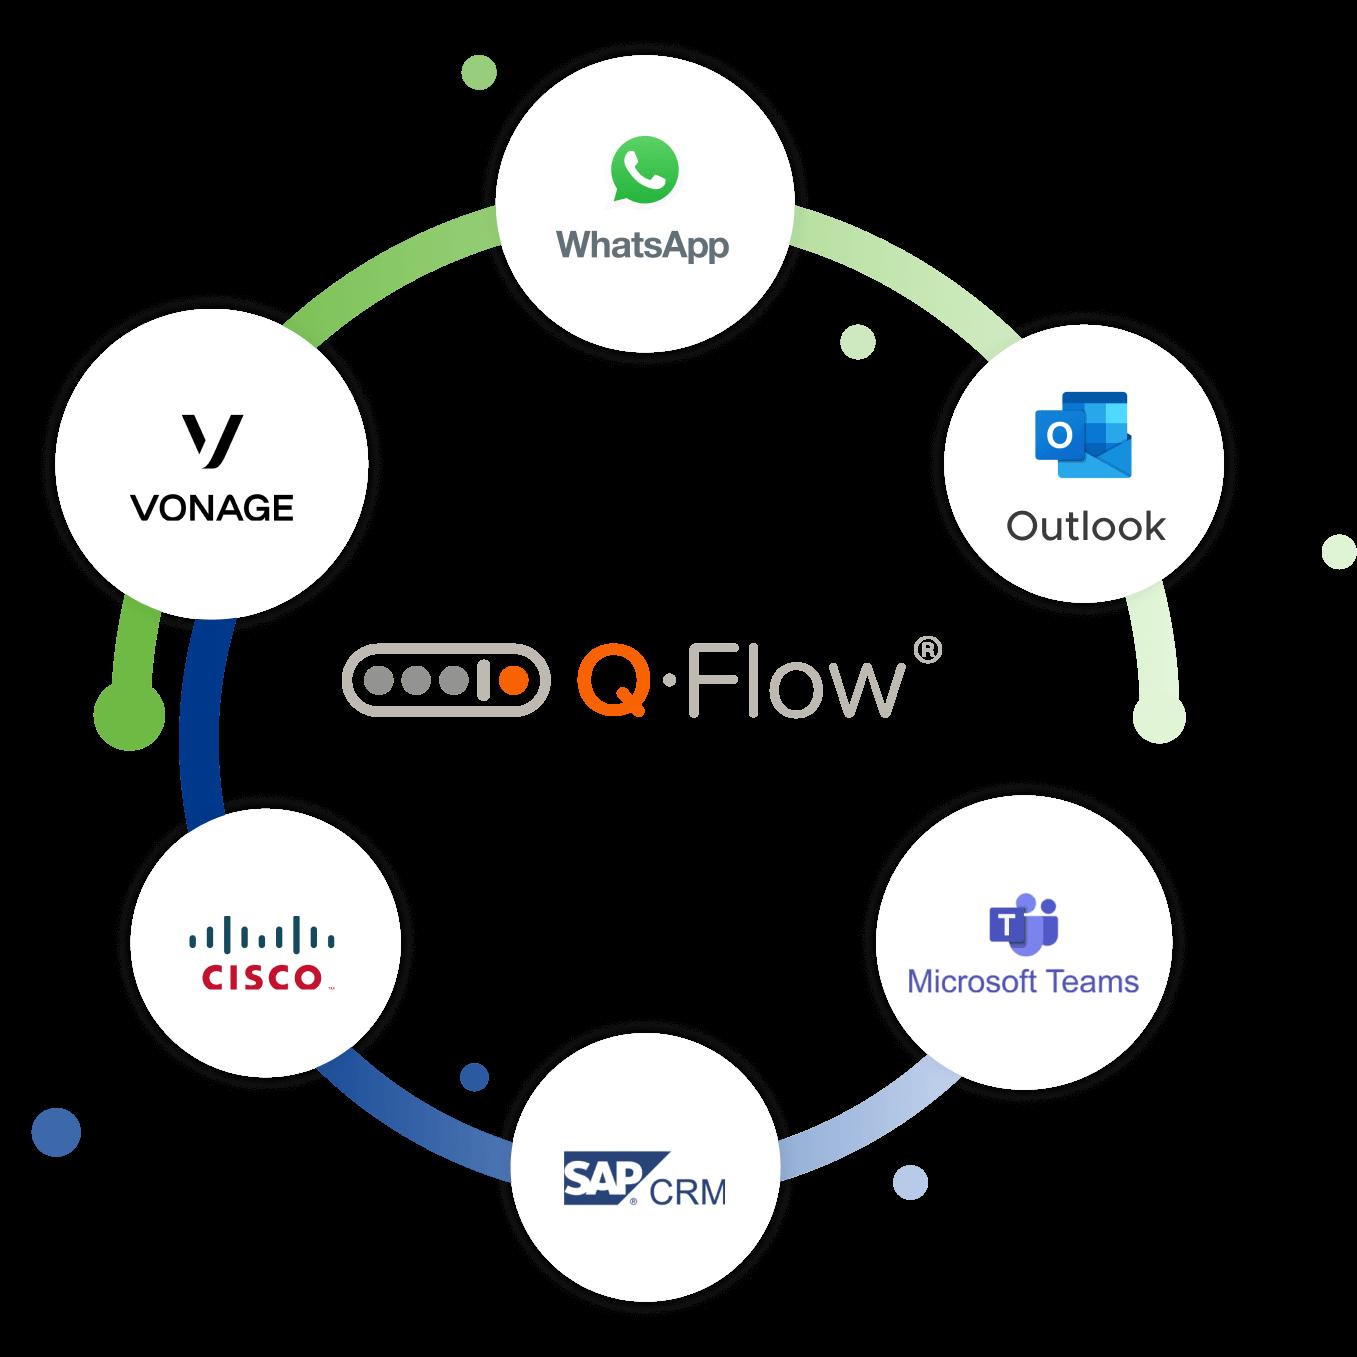 Q-flow-visual